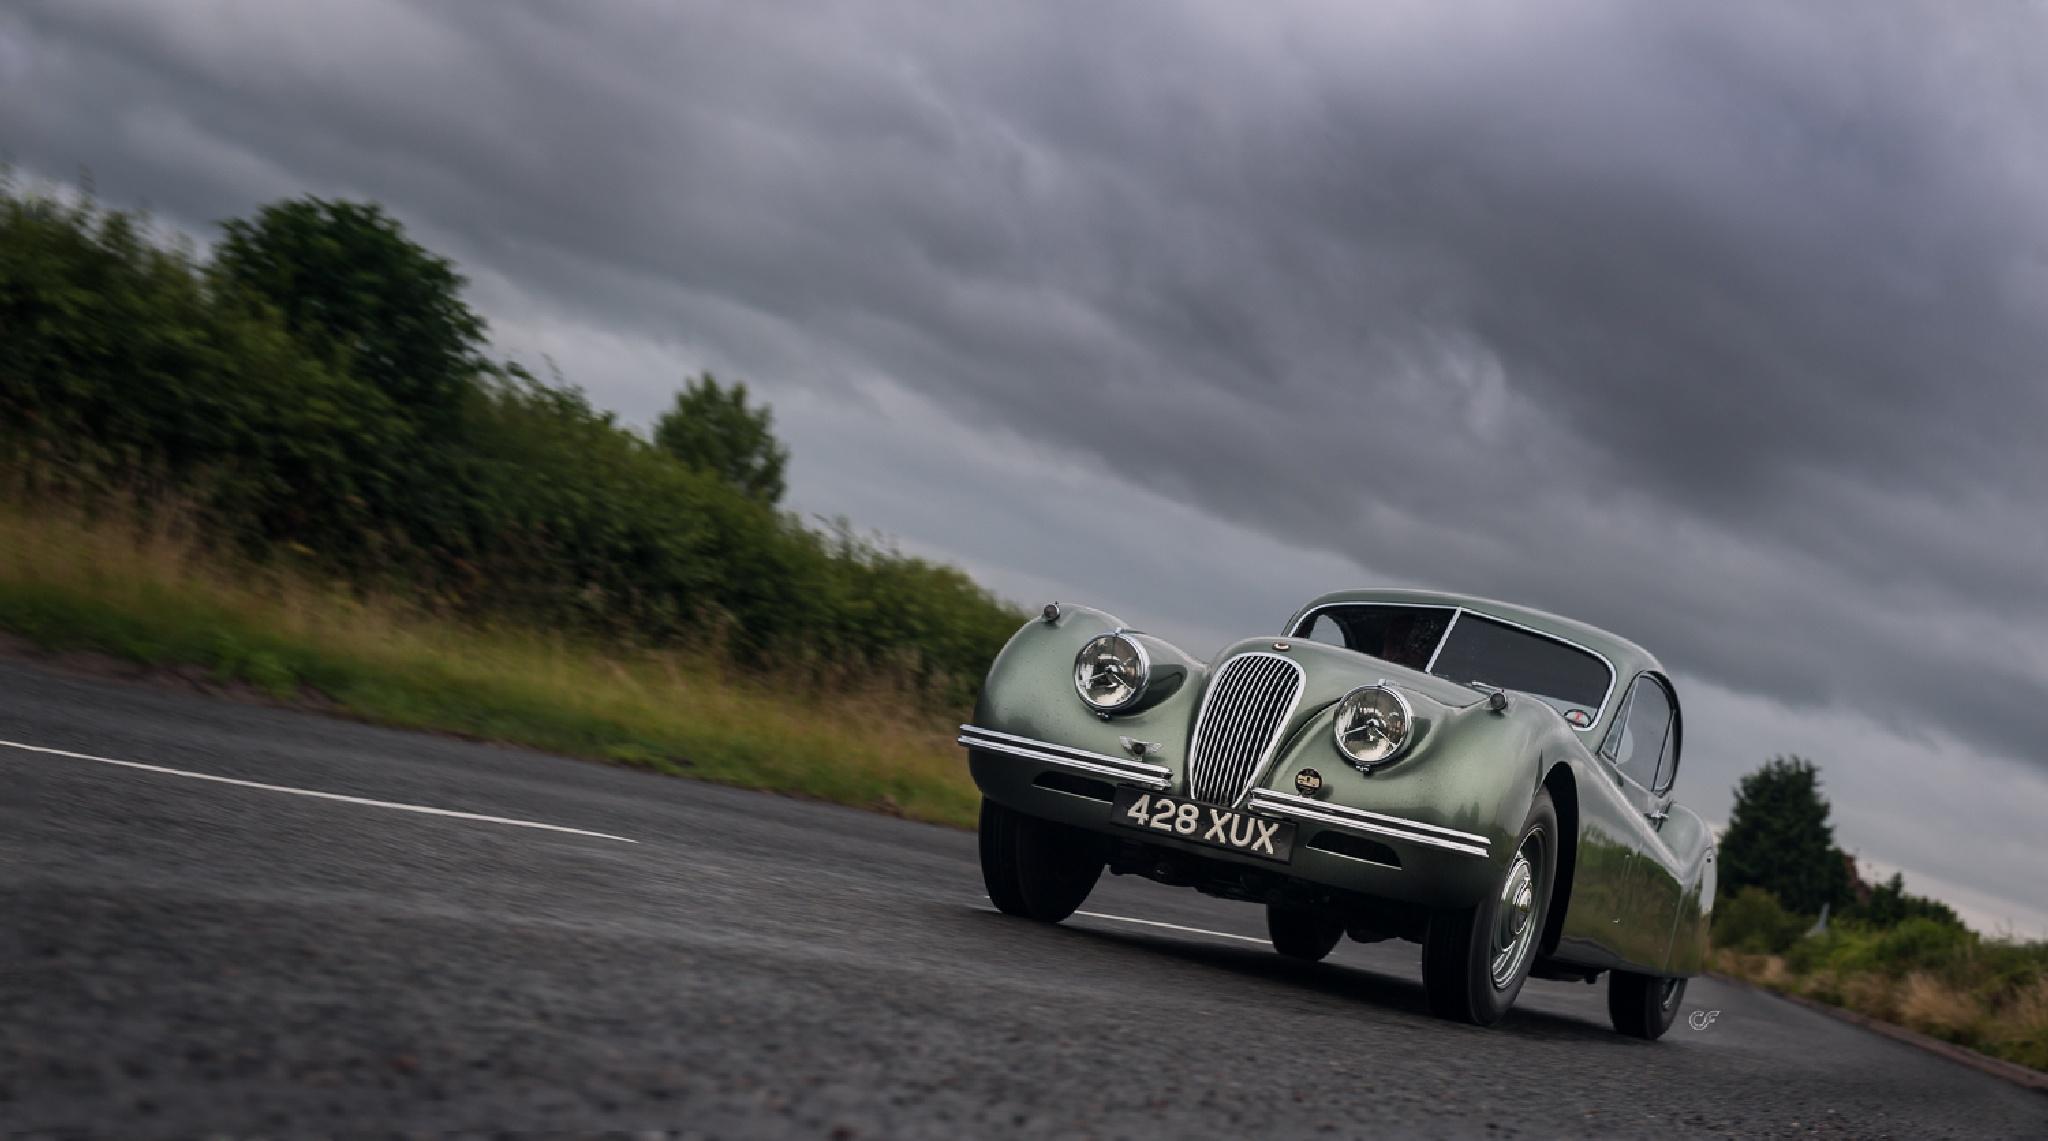 Jaguar XK120 by Chris Frosin